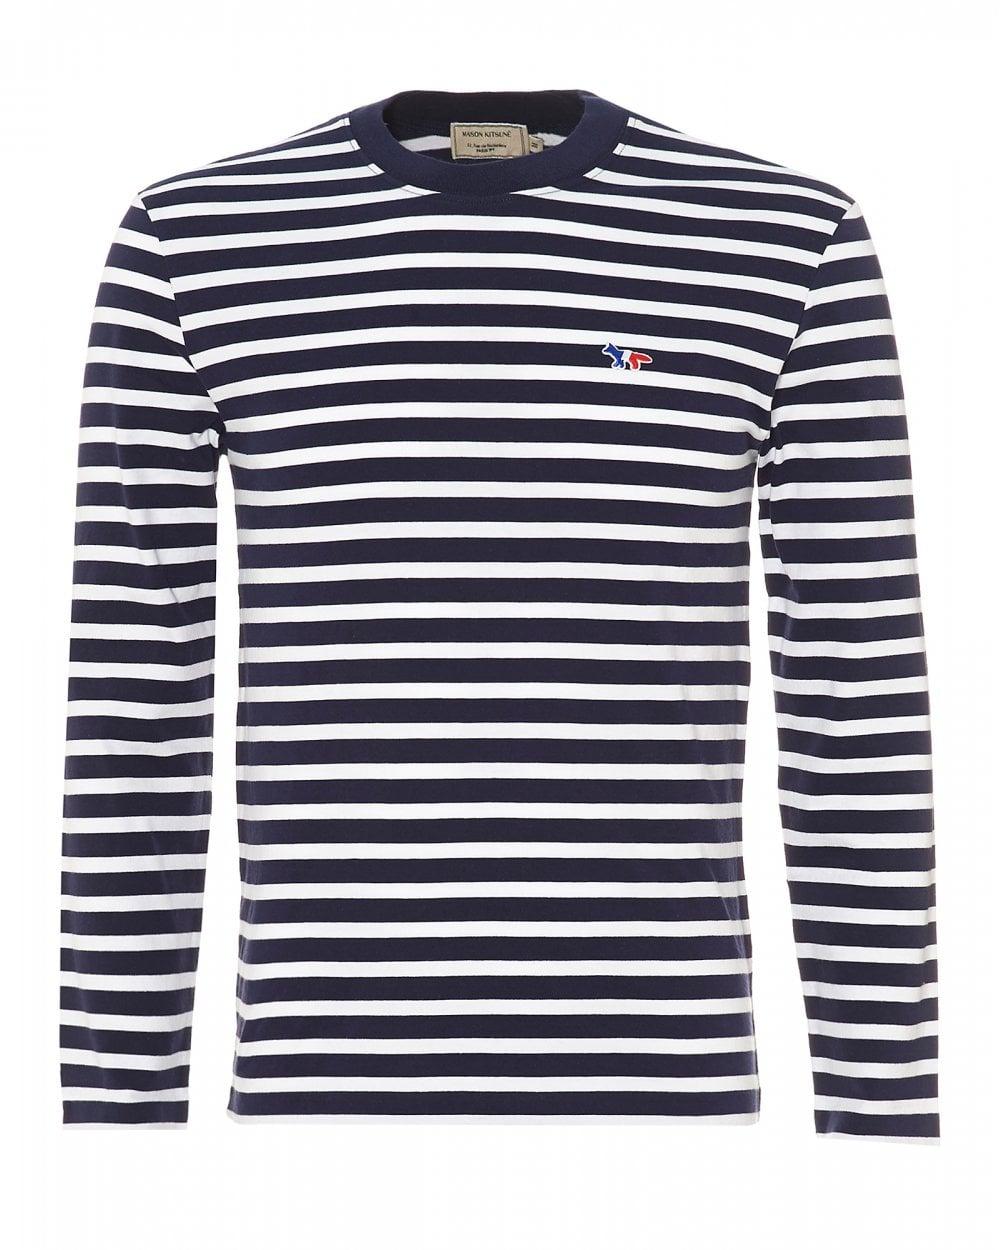 227c92e8dbf0 Maison Kitsune Mens Striped Fox Patch T-Shirt